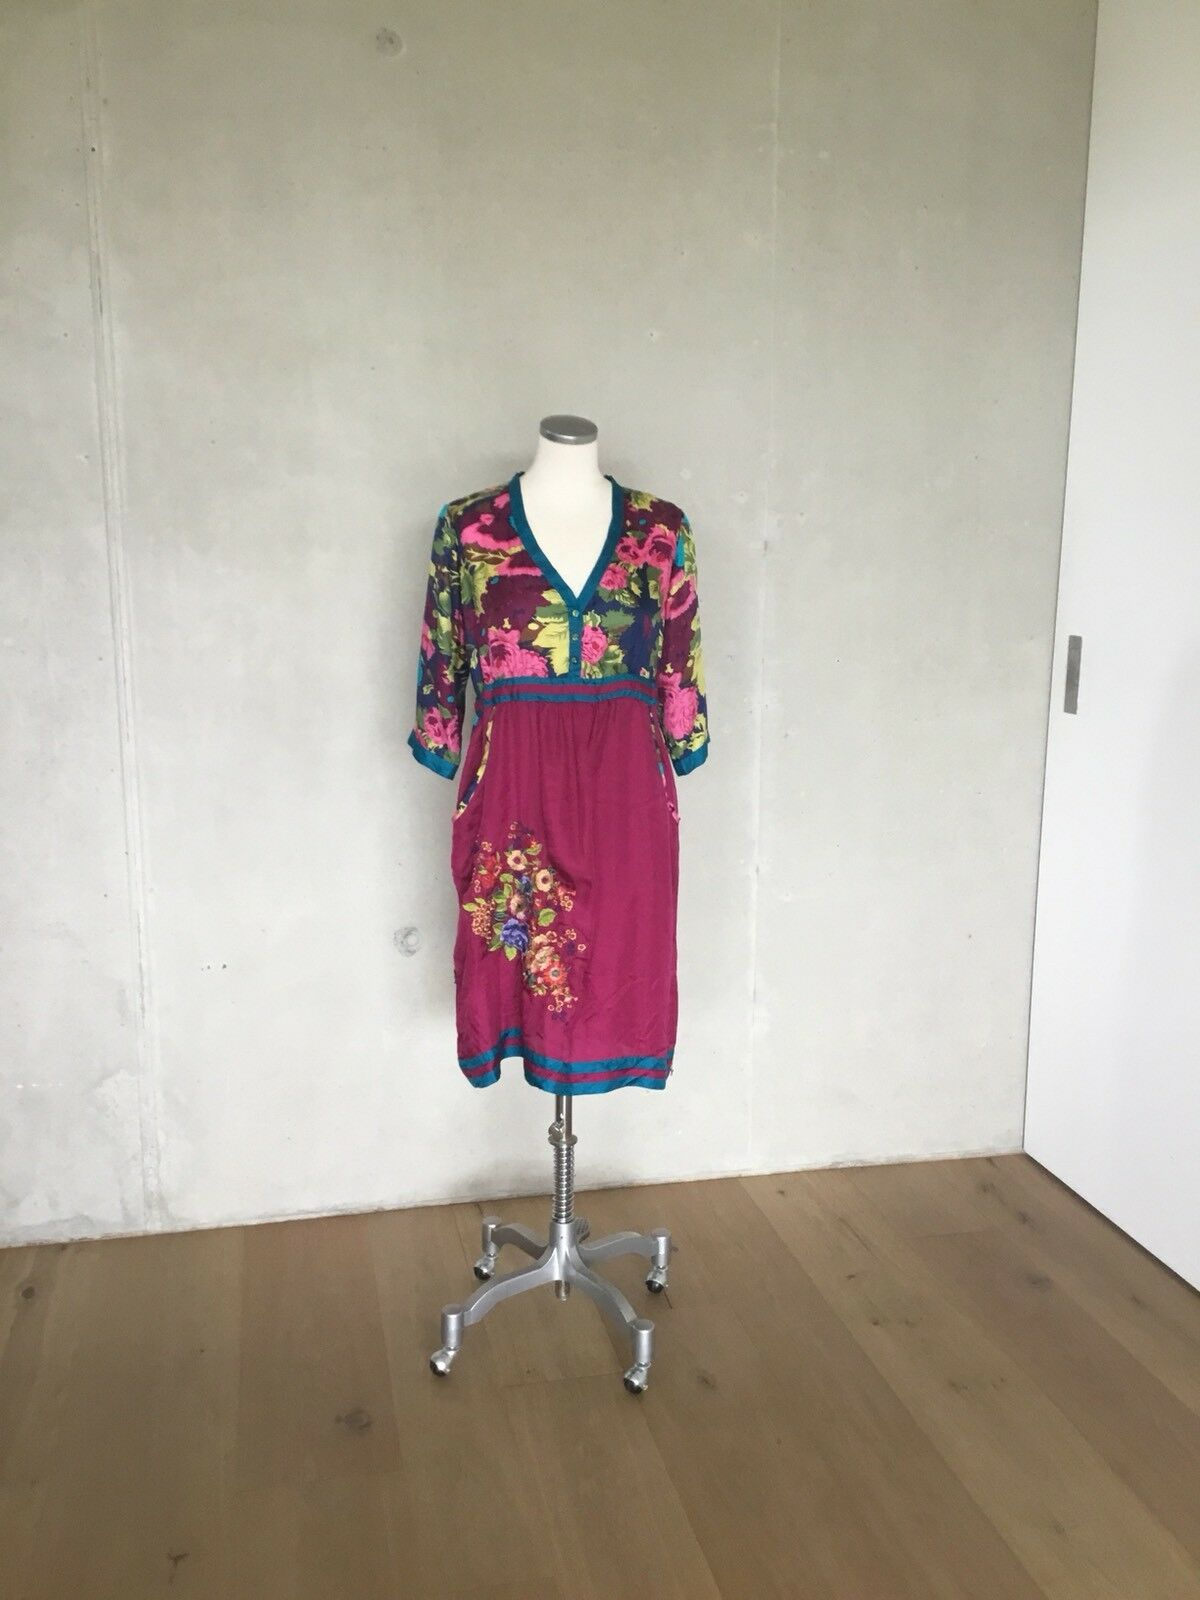 Johnny Was  LA Seidenkleid Kleid  Tunika Gr S   34 36 Traumhaft